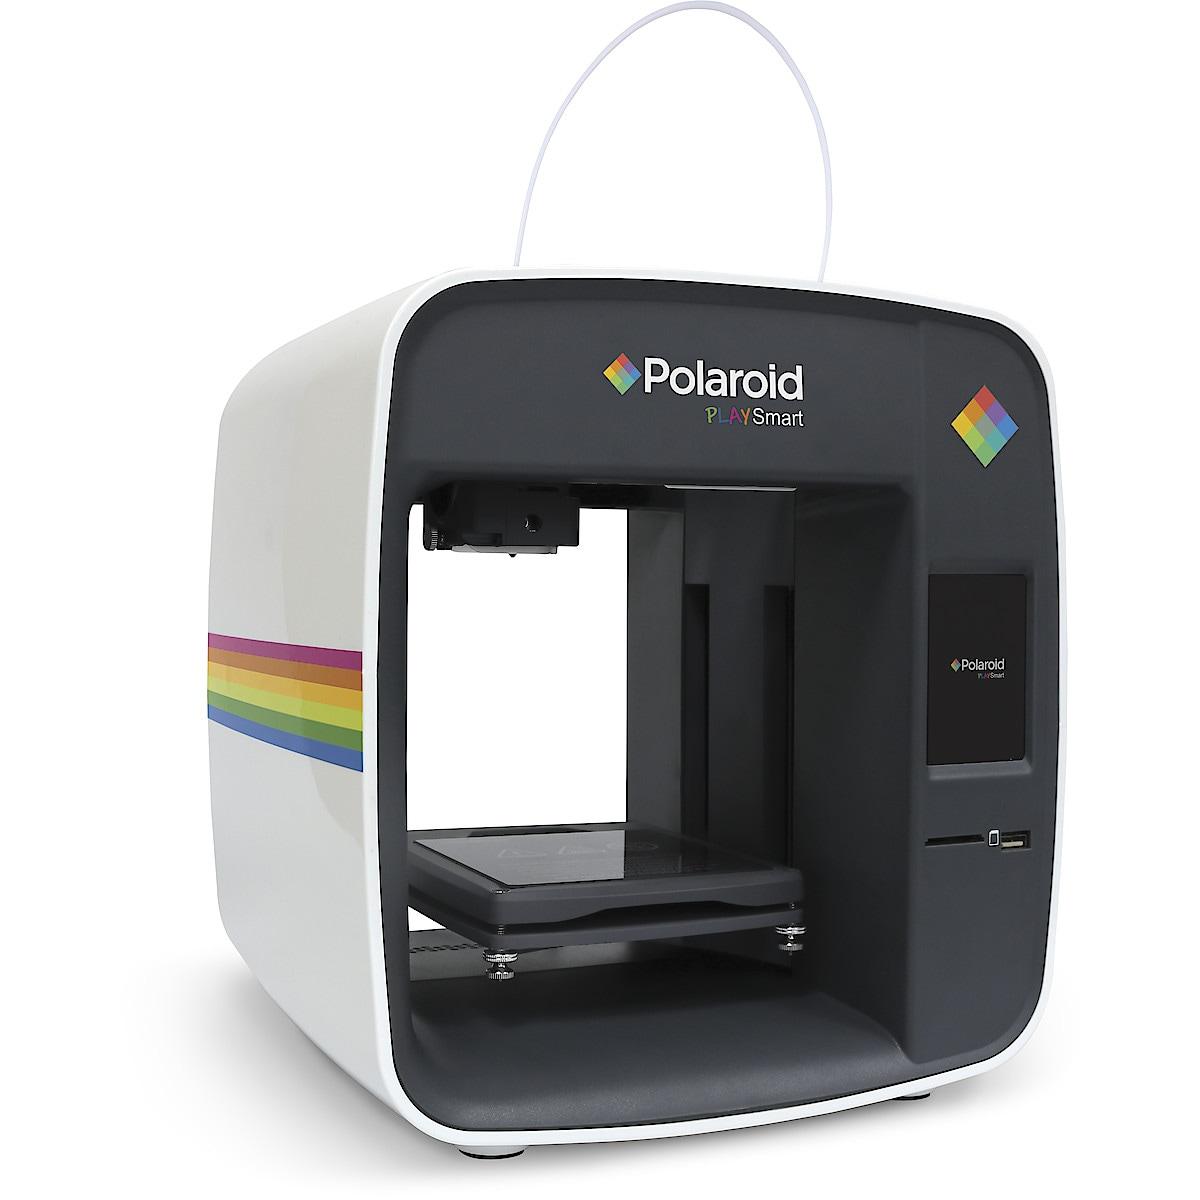 3D-skrivare Polaroid PlaySmart